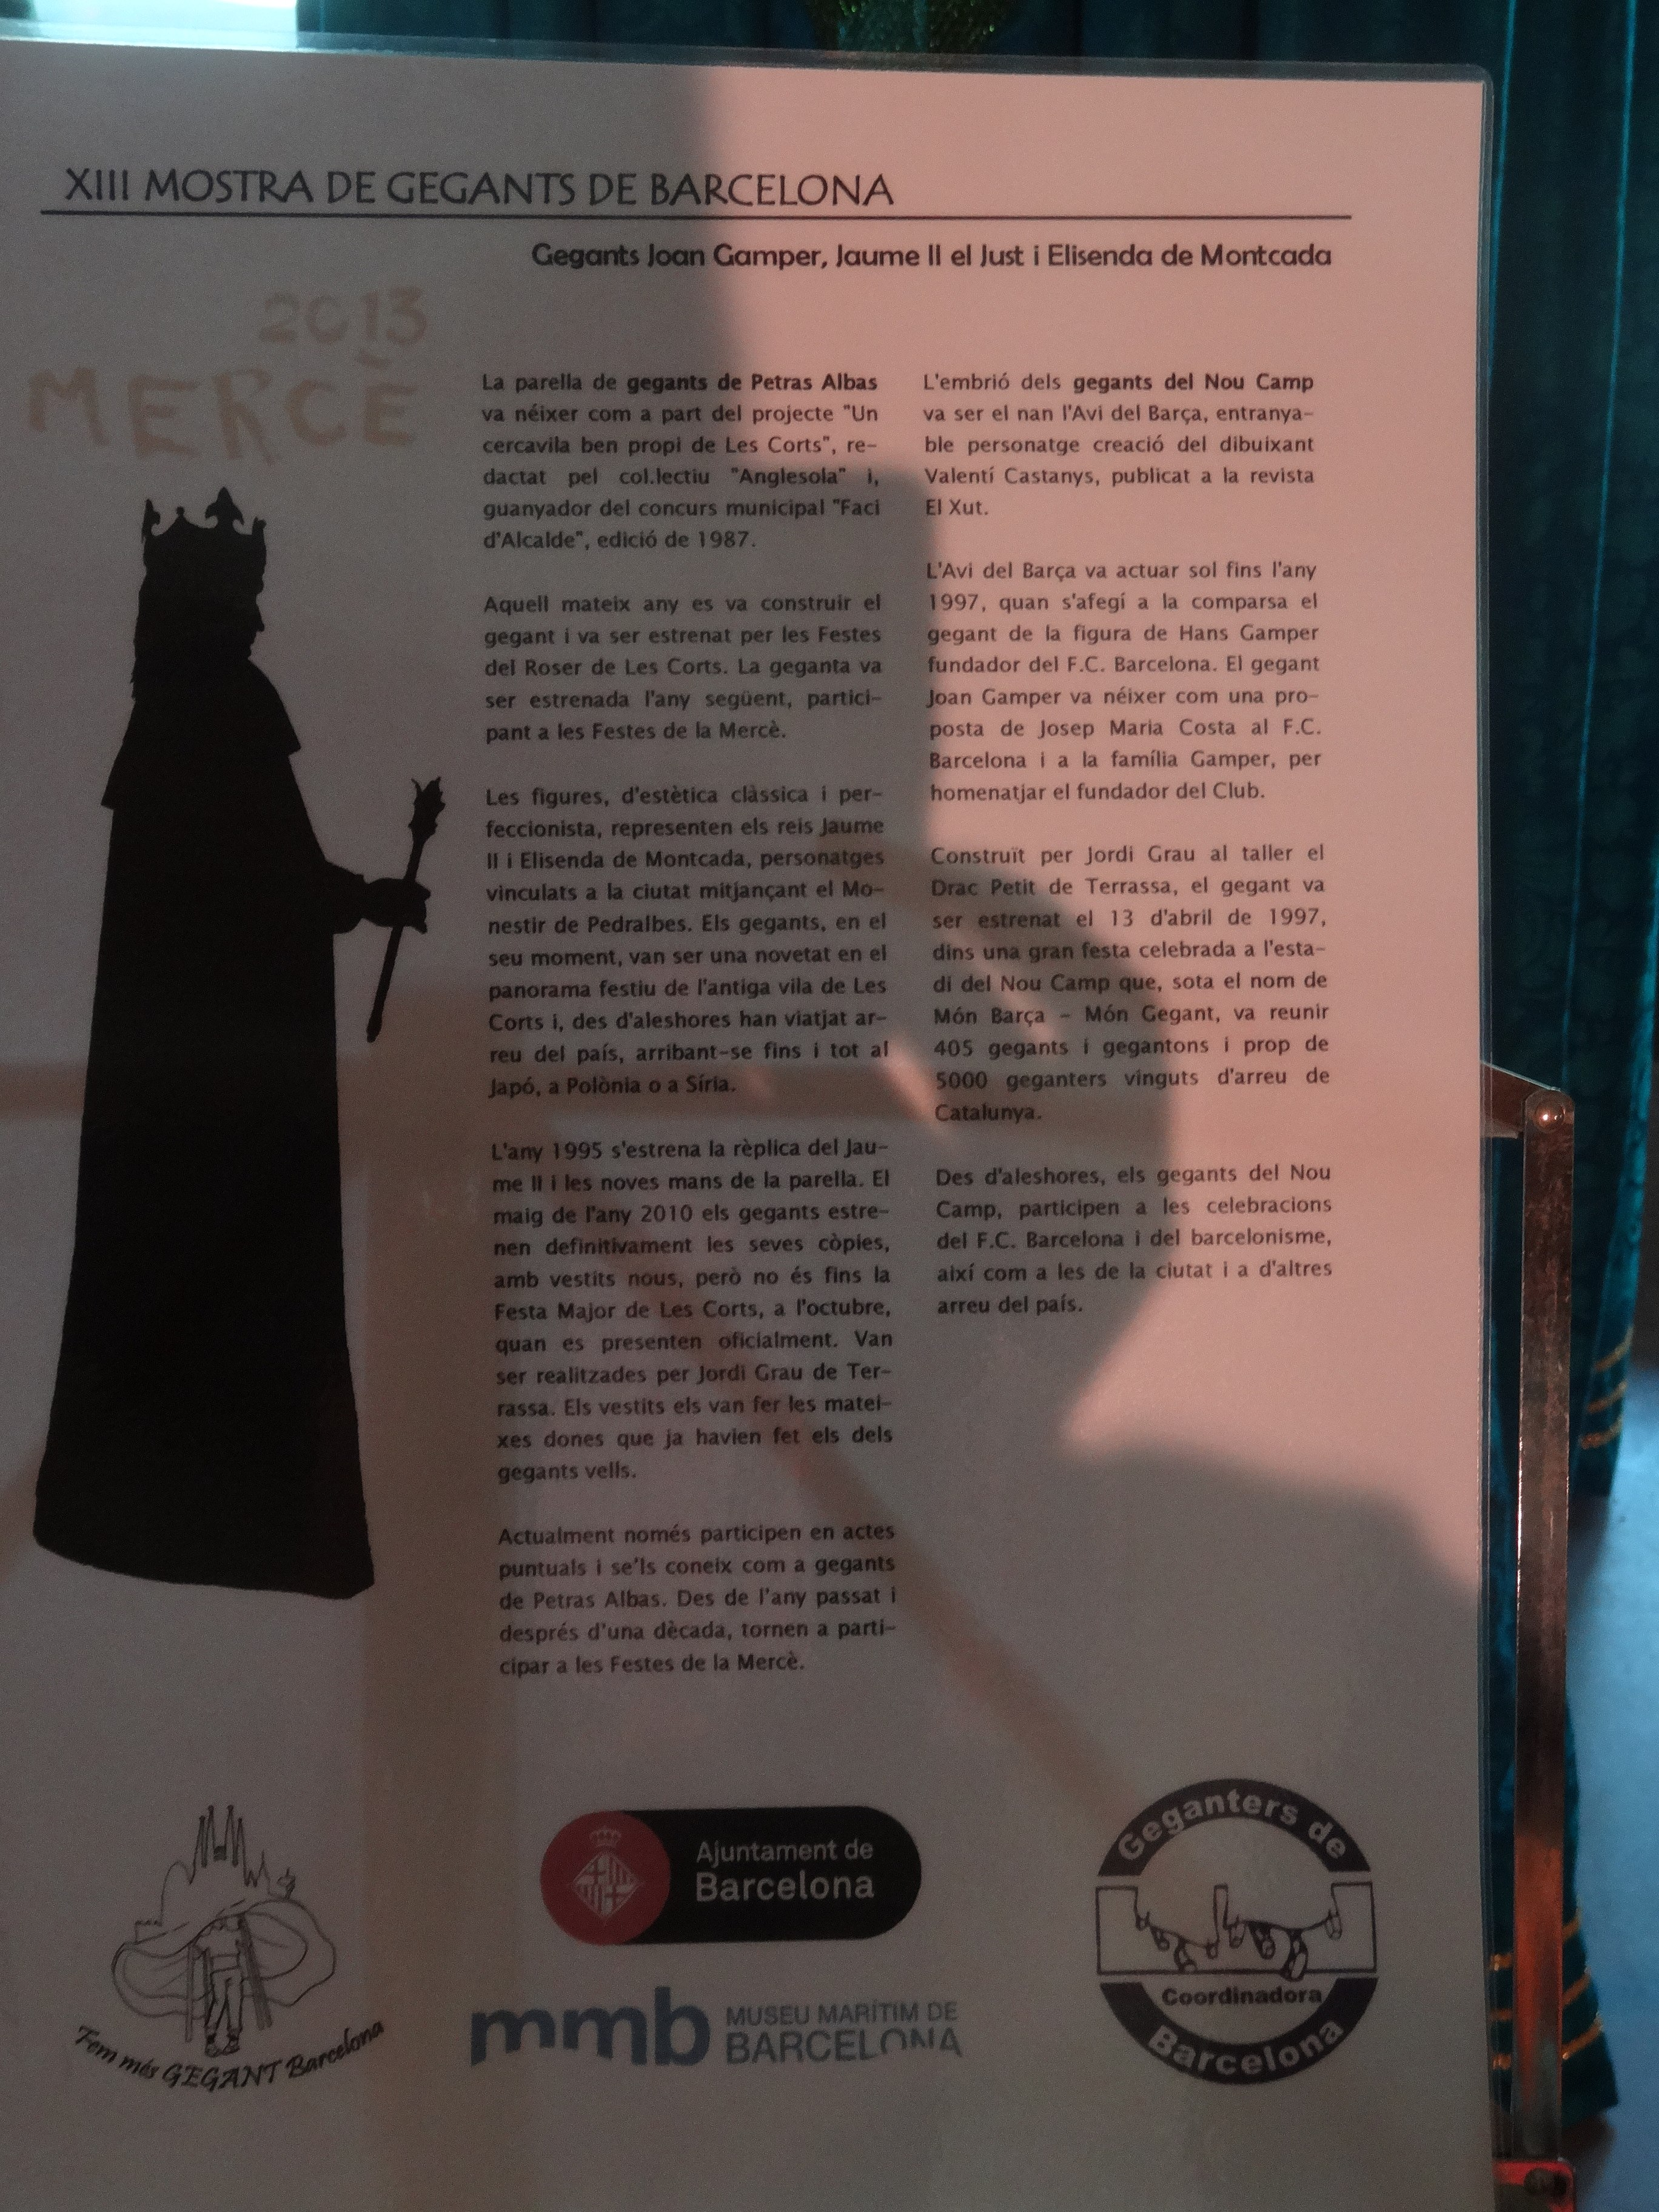 Parti Di Una Barca file:gegants al museu marítim - 38 - gegants joan gamper